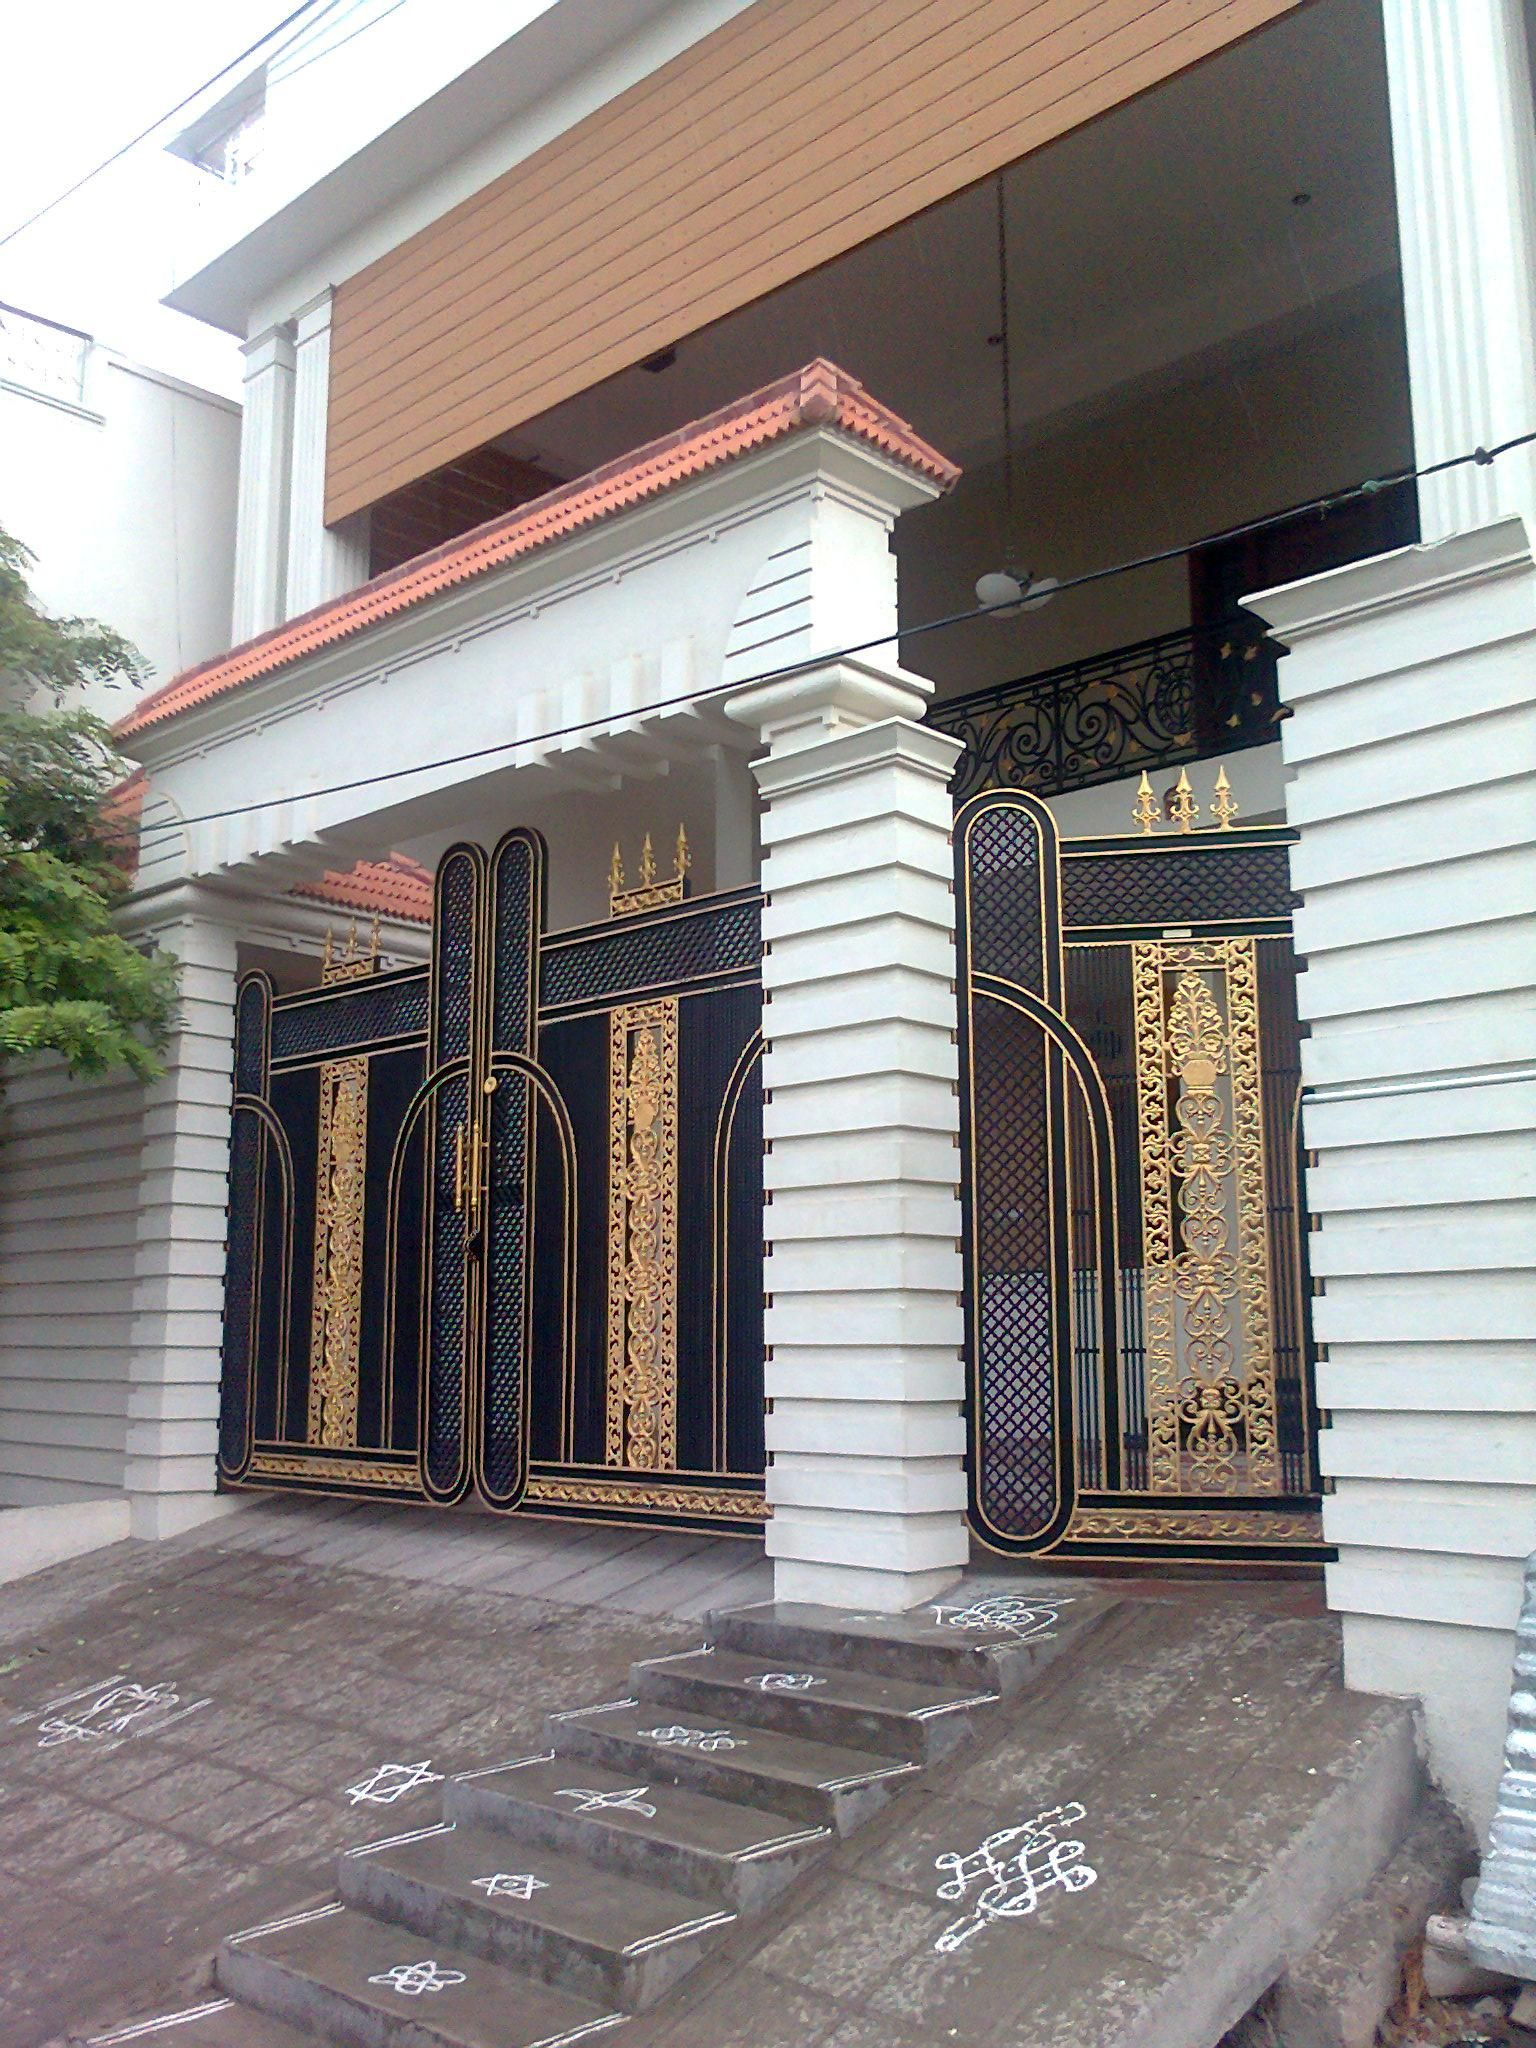 Entrance gate design for home - GharExpert | home and garden ...